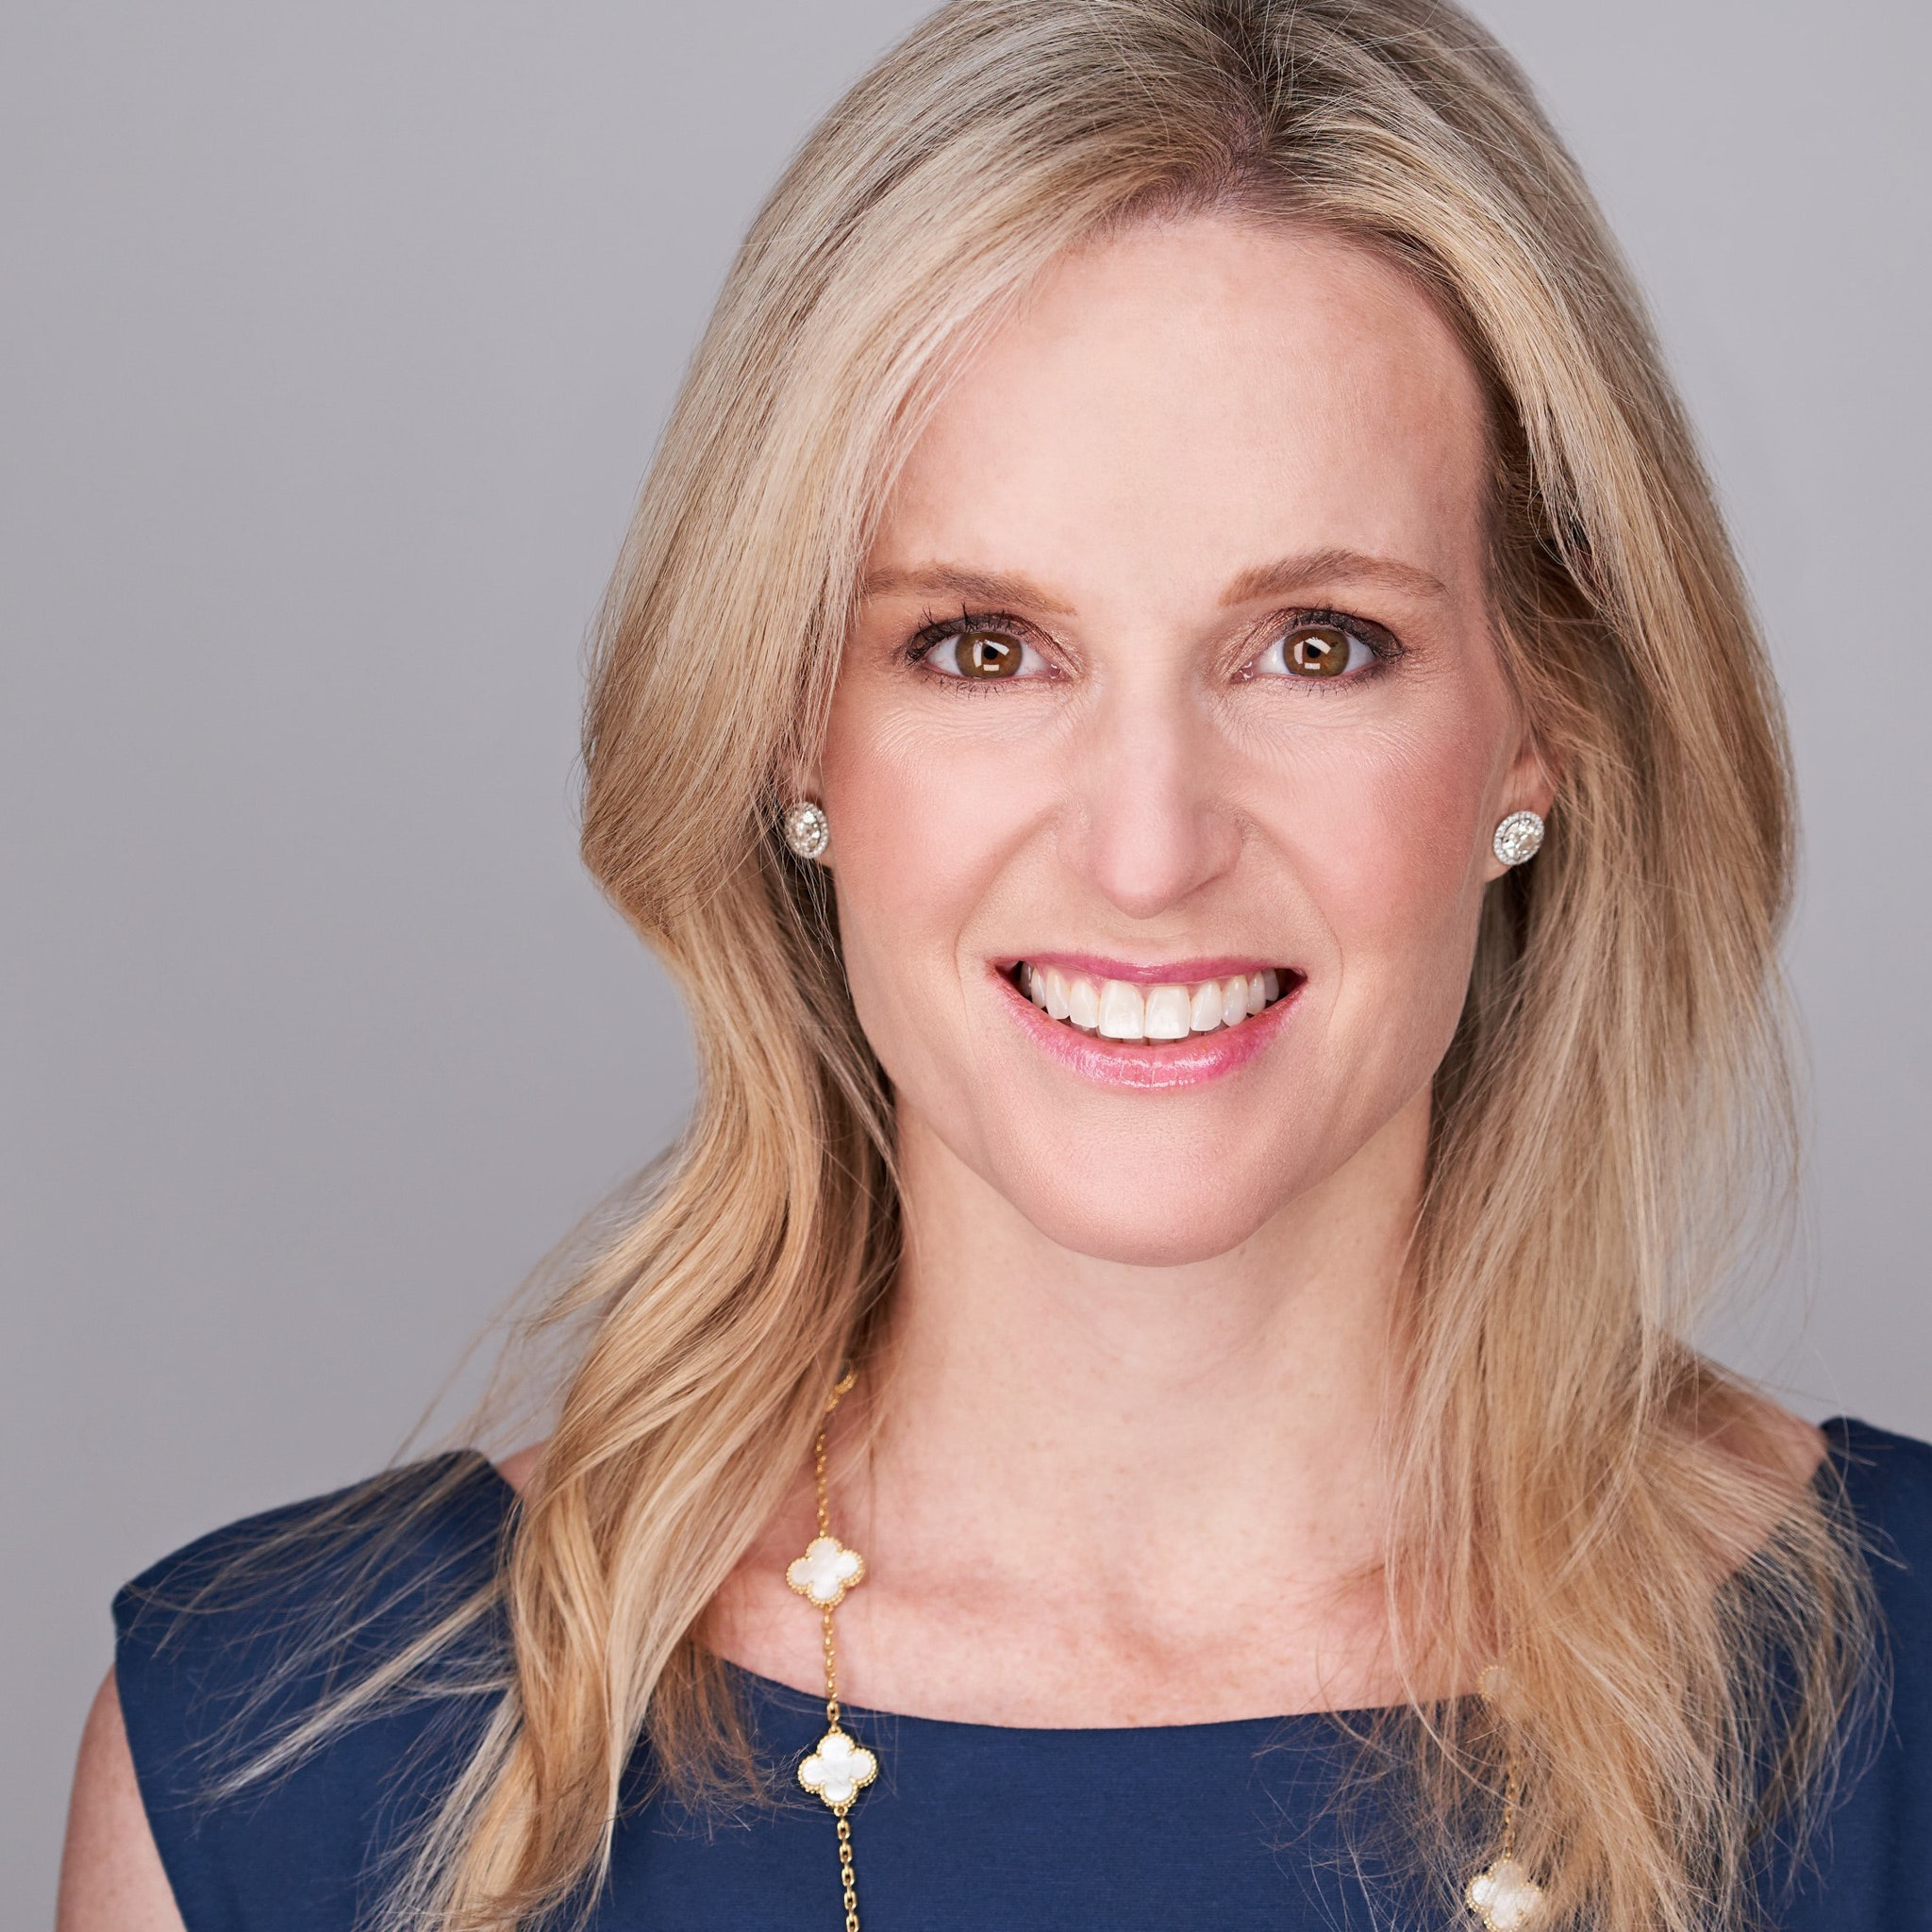 Dermatologist and Mom of 3, Dr. Julie Karen, on the Elusive Concept of Work-Life Balance